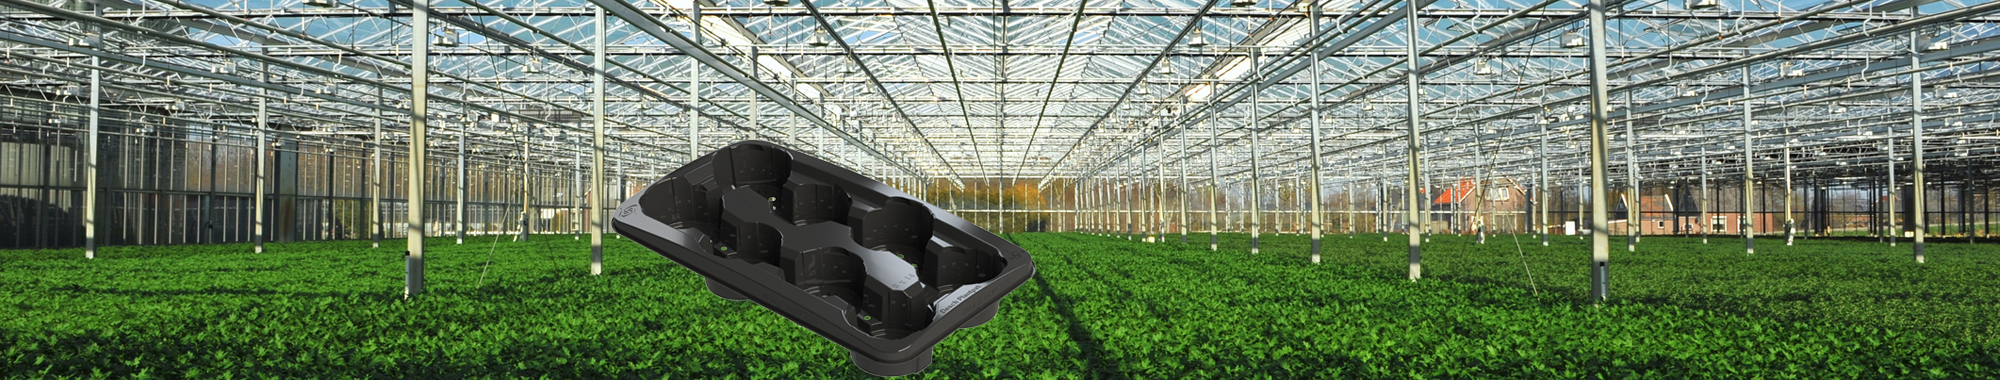 dexterMT-header-tuinbouw-plantentray-2000x380px